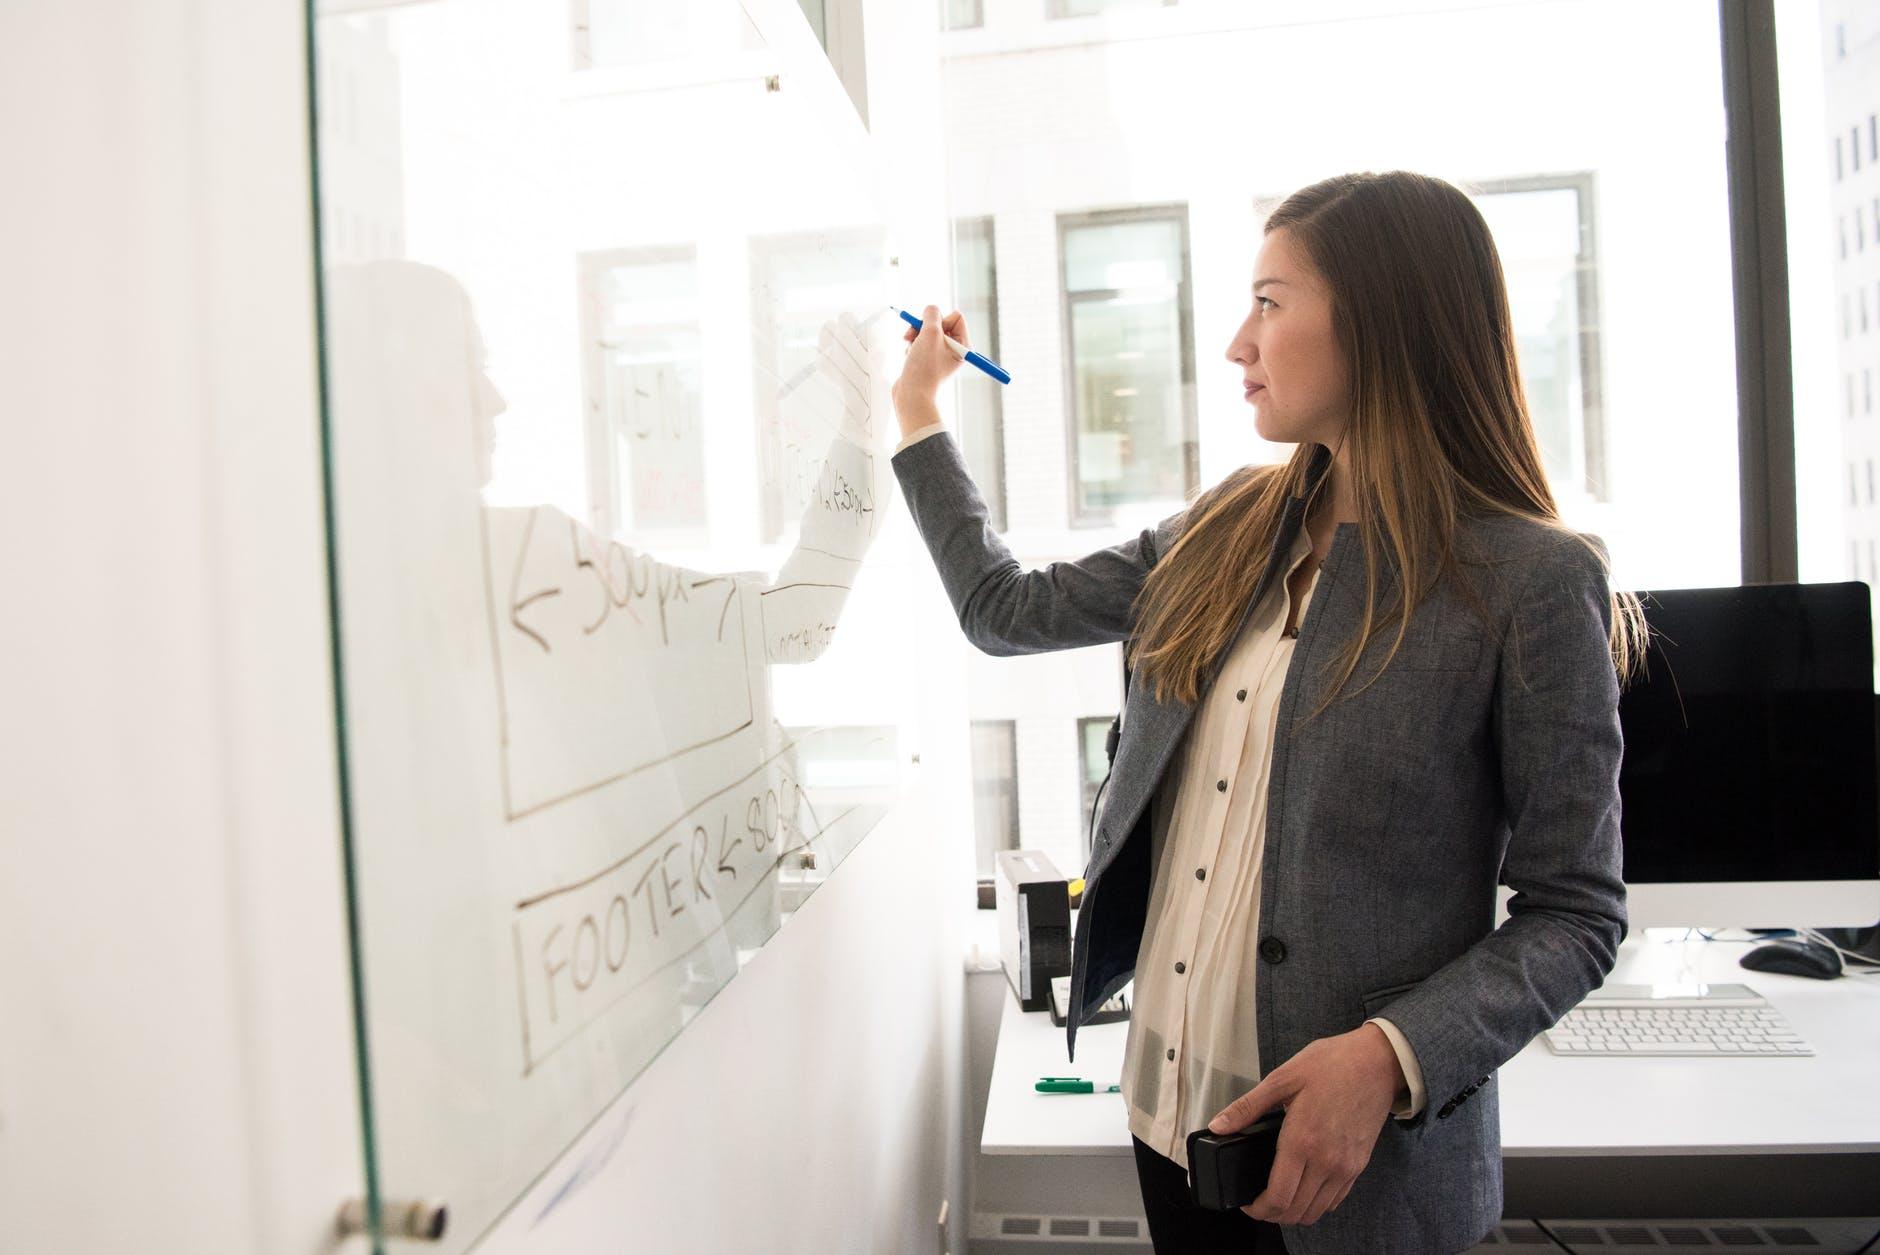 woman wearing gray blazer writing on dry erase board